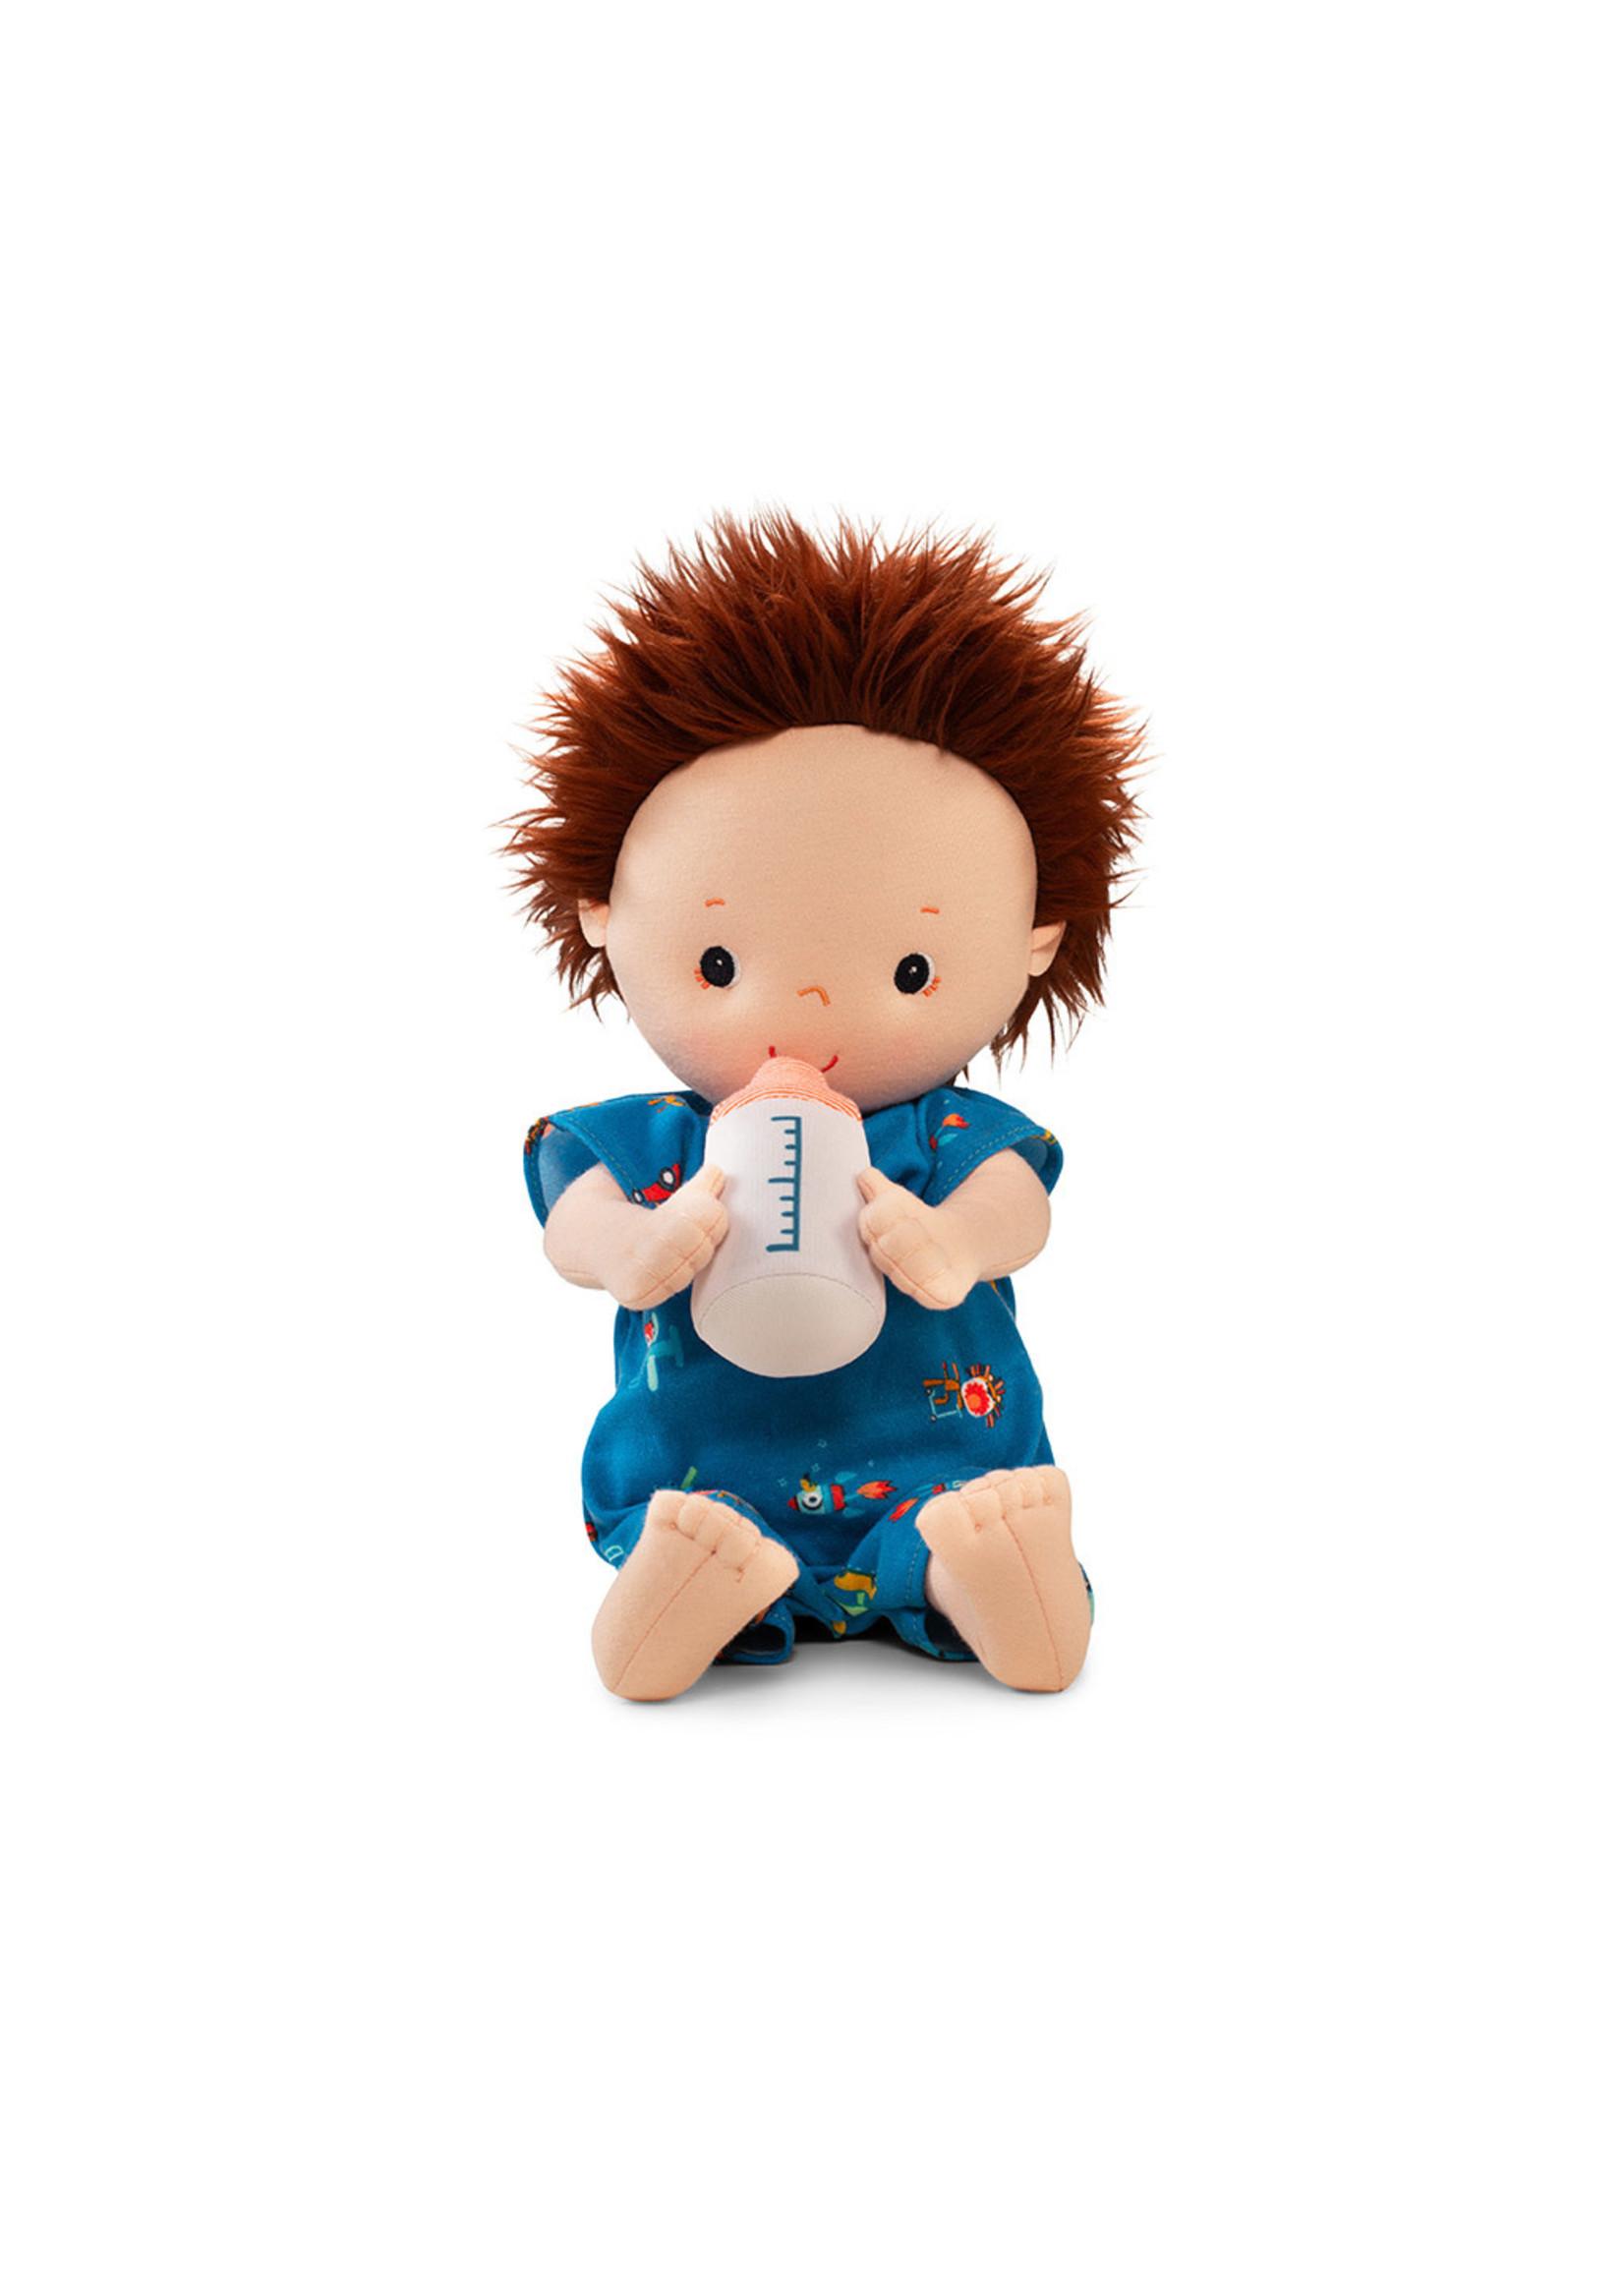 Lilliputie Lilliputiens Noa Doll